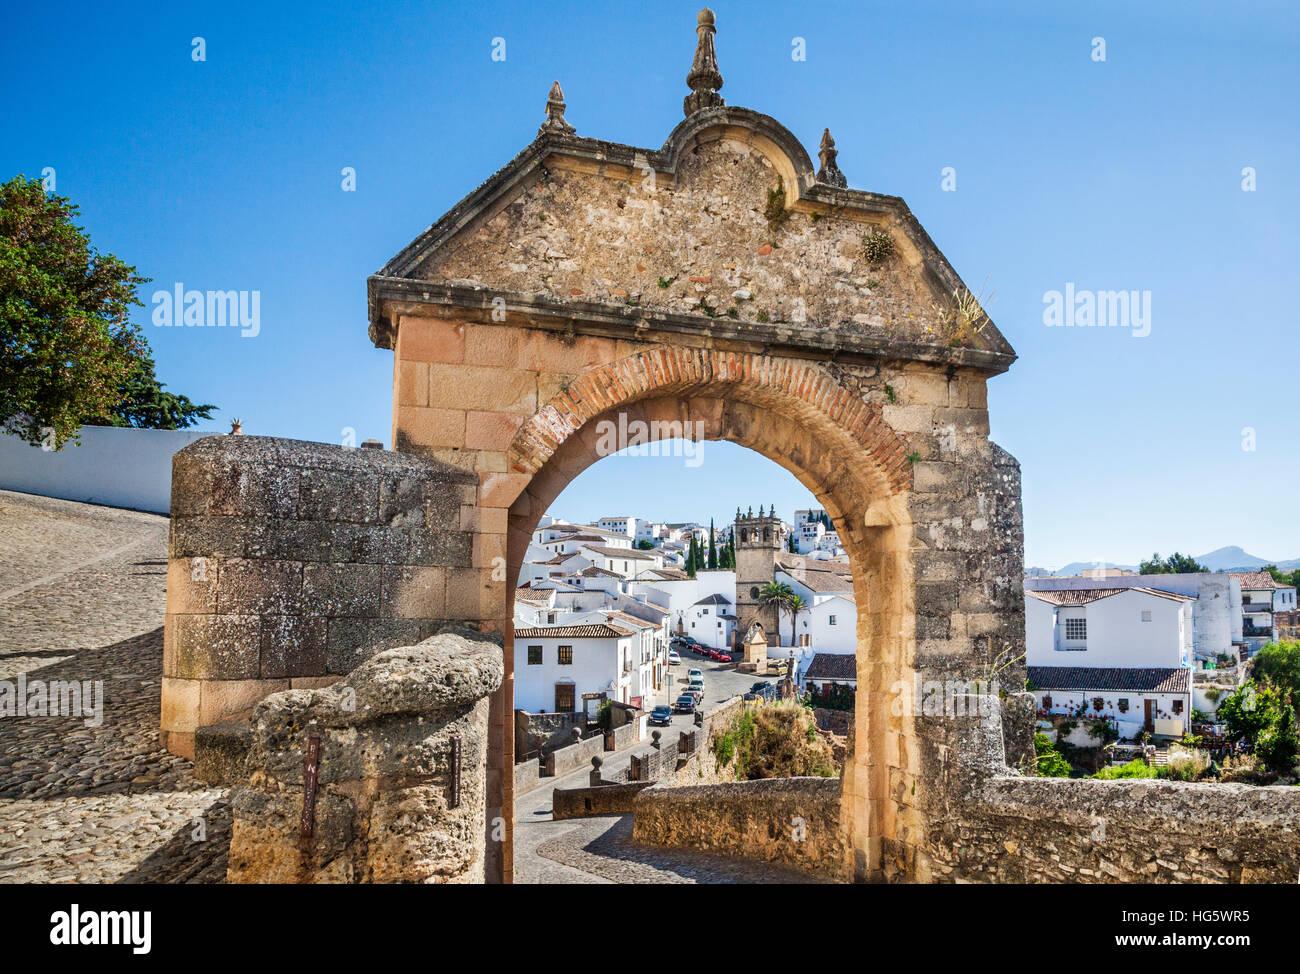 Spanien, Andalusien, Provinz Malaga, Ronda, Iglesia de Nuestro Padre Jesus und Puente Viejo (alte Brücke), Stockbild